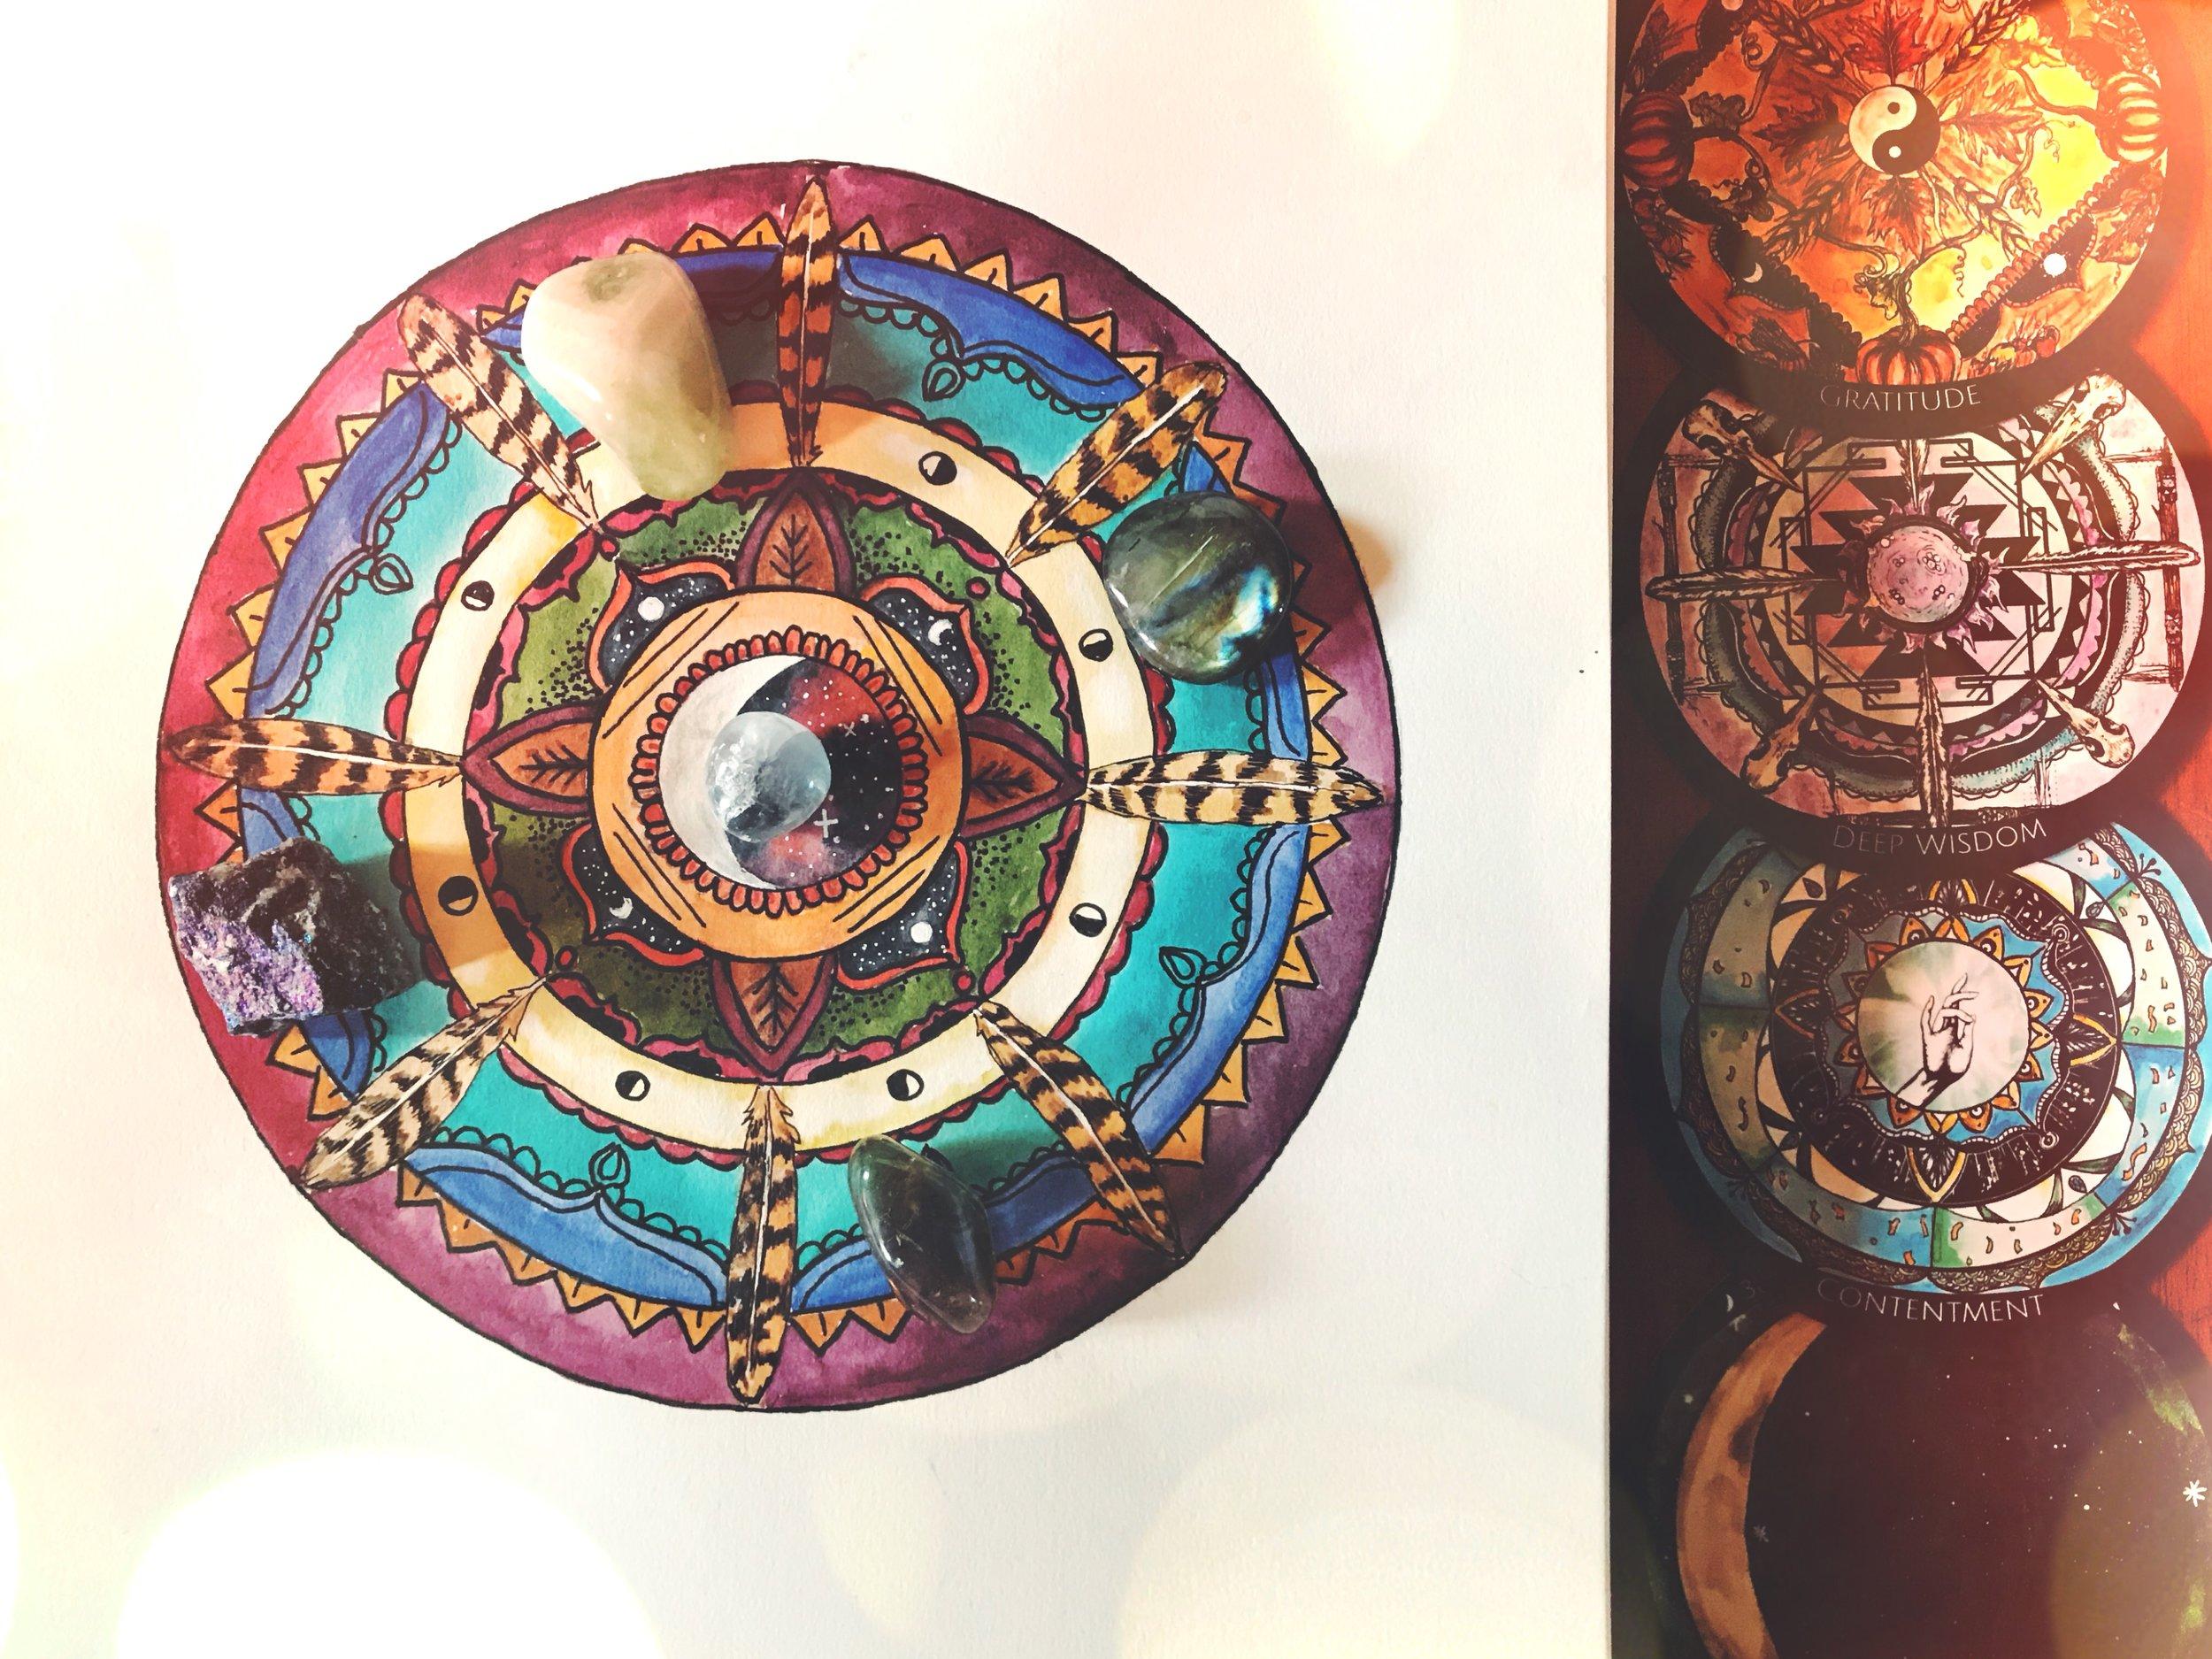 Making Your Own Moondala Mandala | Spirit de la Lune